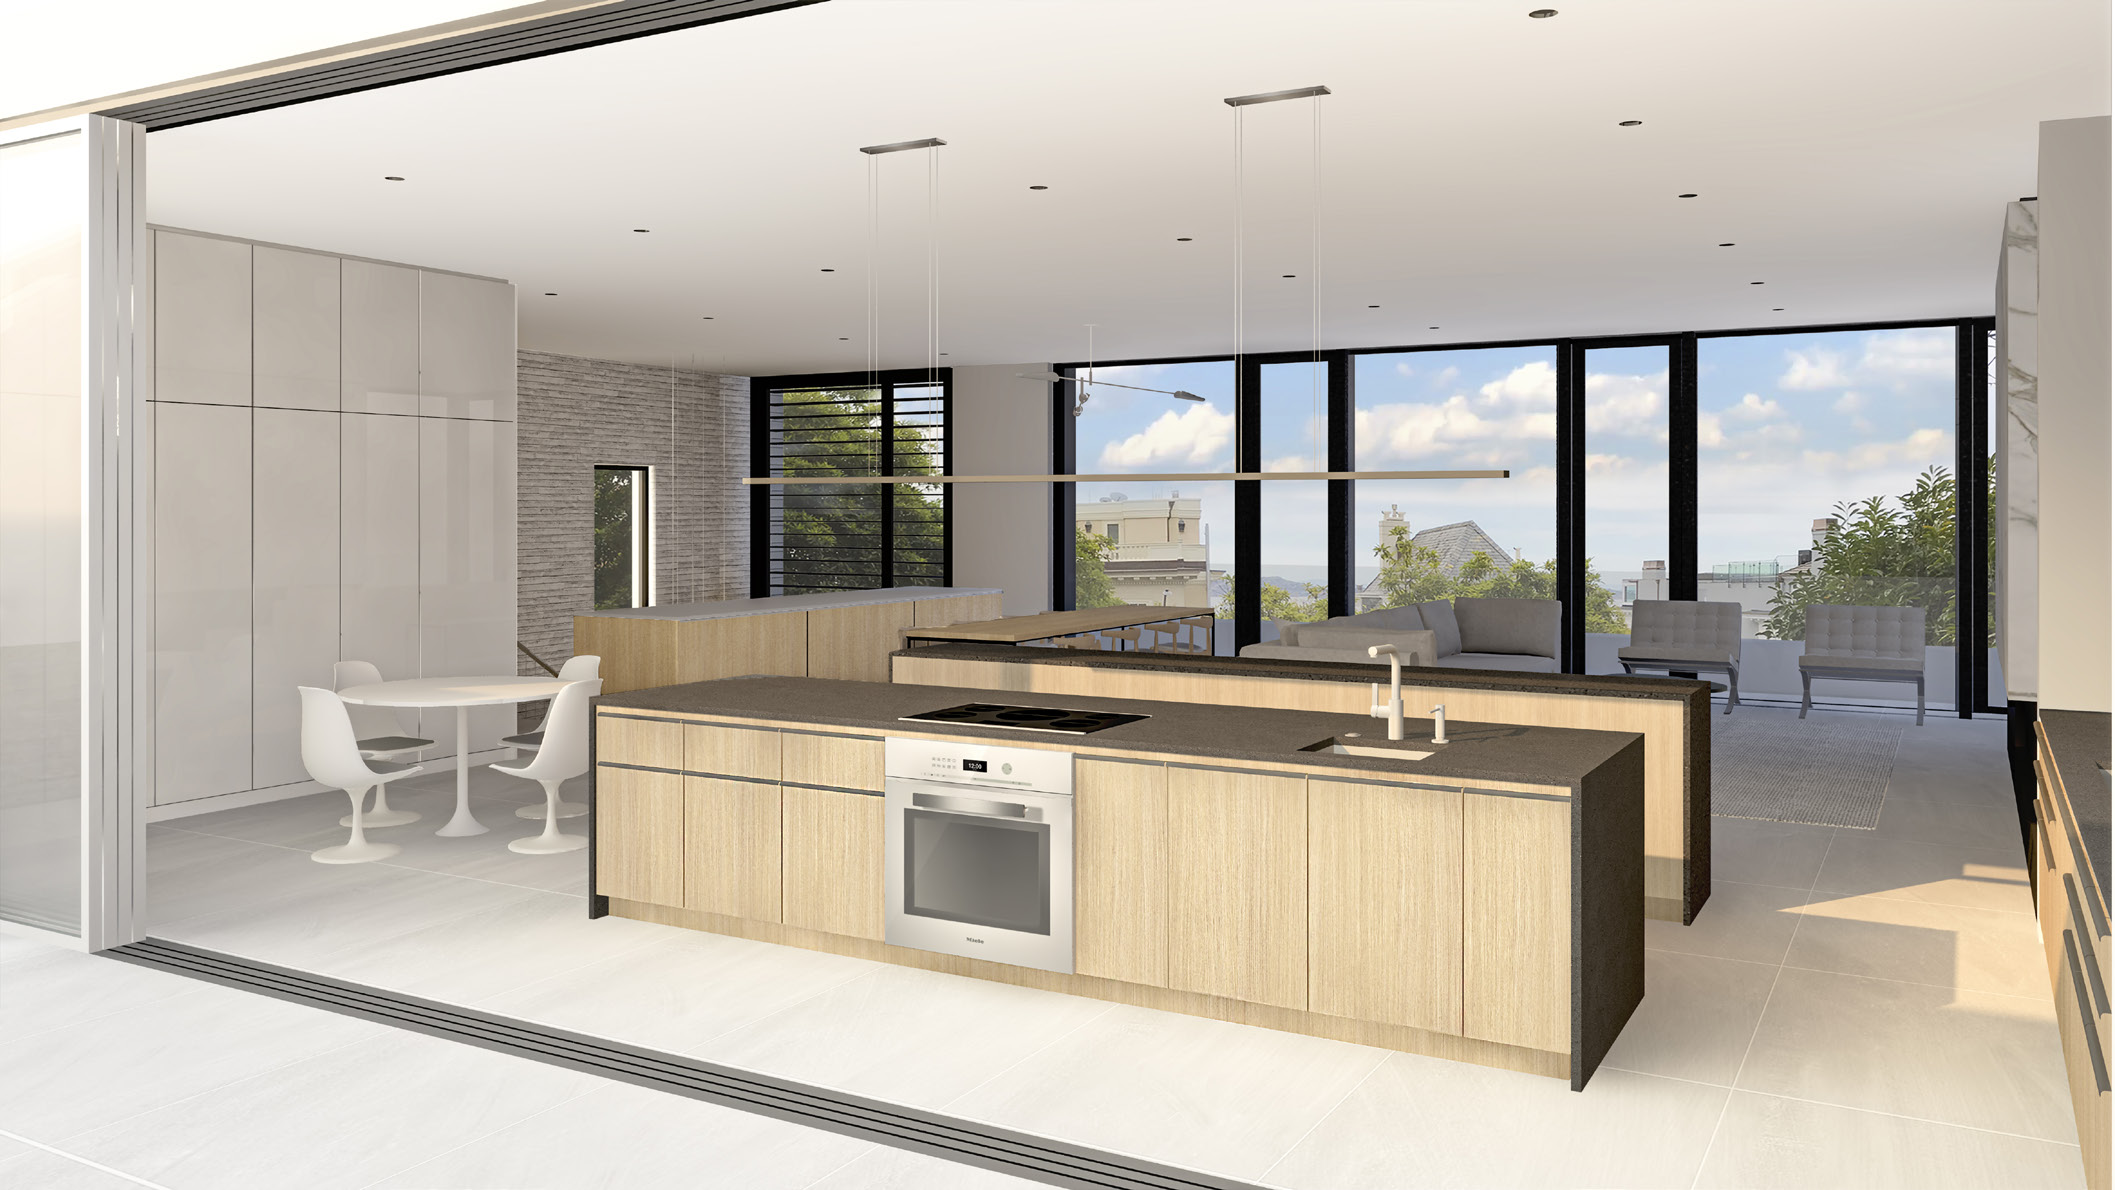 NEW_2921 Vallejo Kitchen2 Renders.jpg